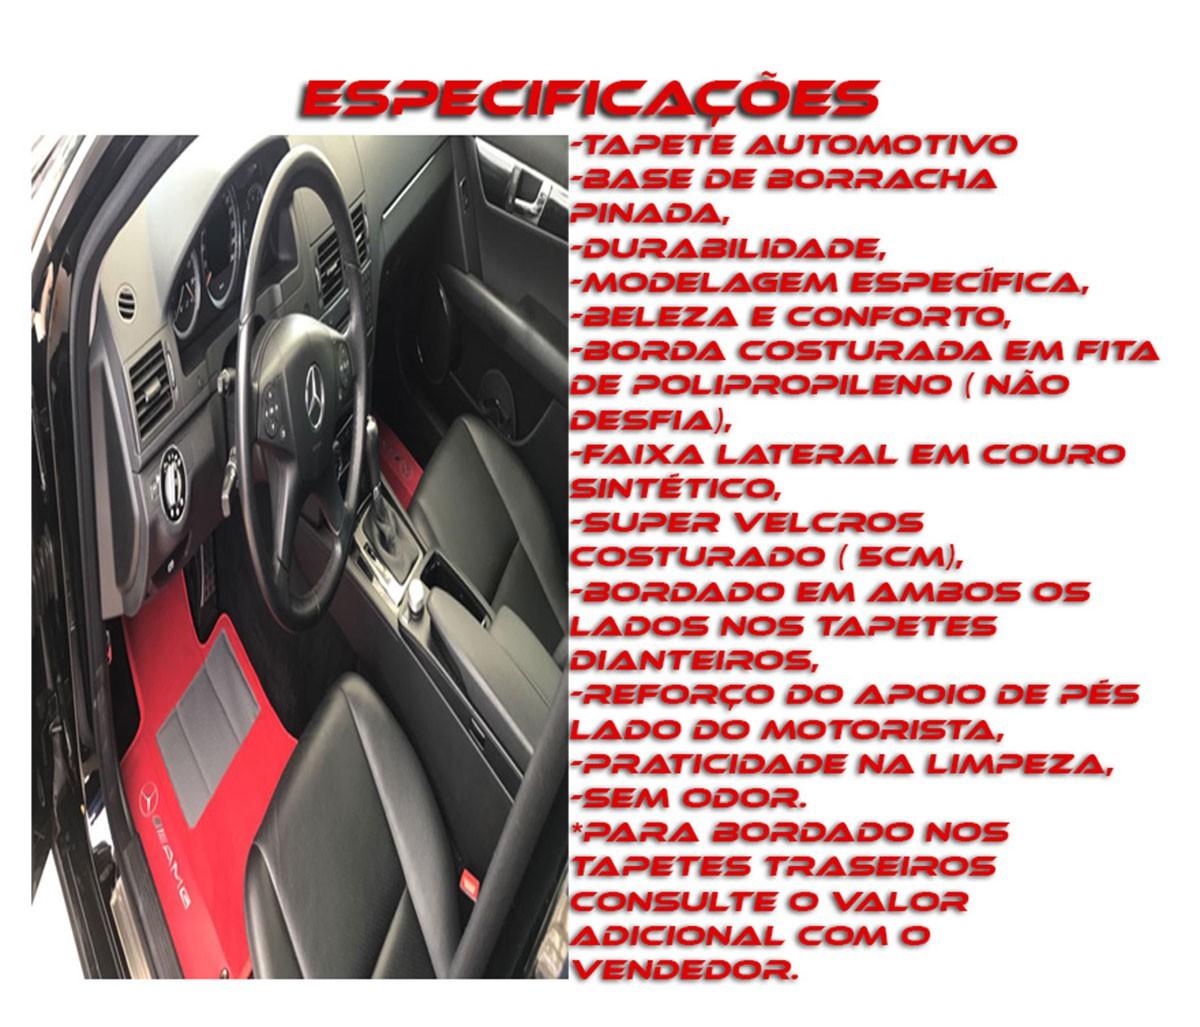 Tapete Audi A3 2014/... Carpete Luxo Base Borracha Pinada